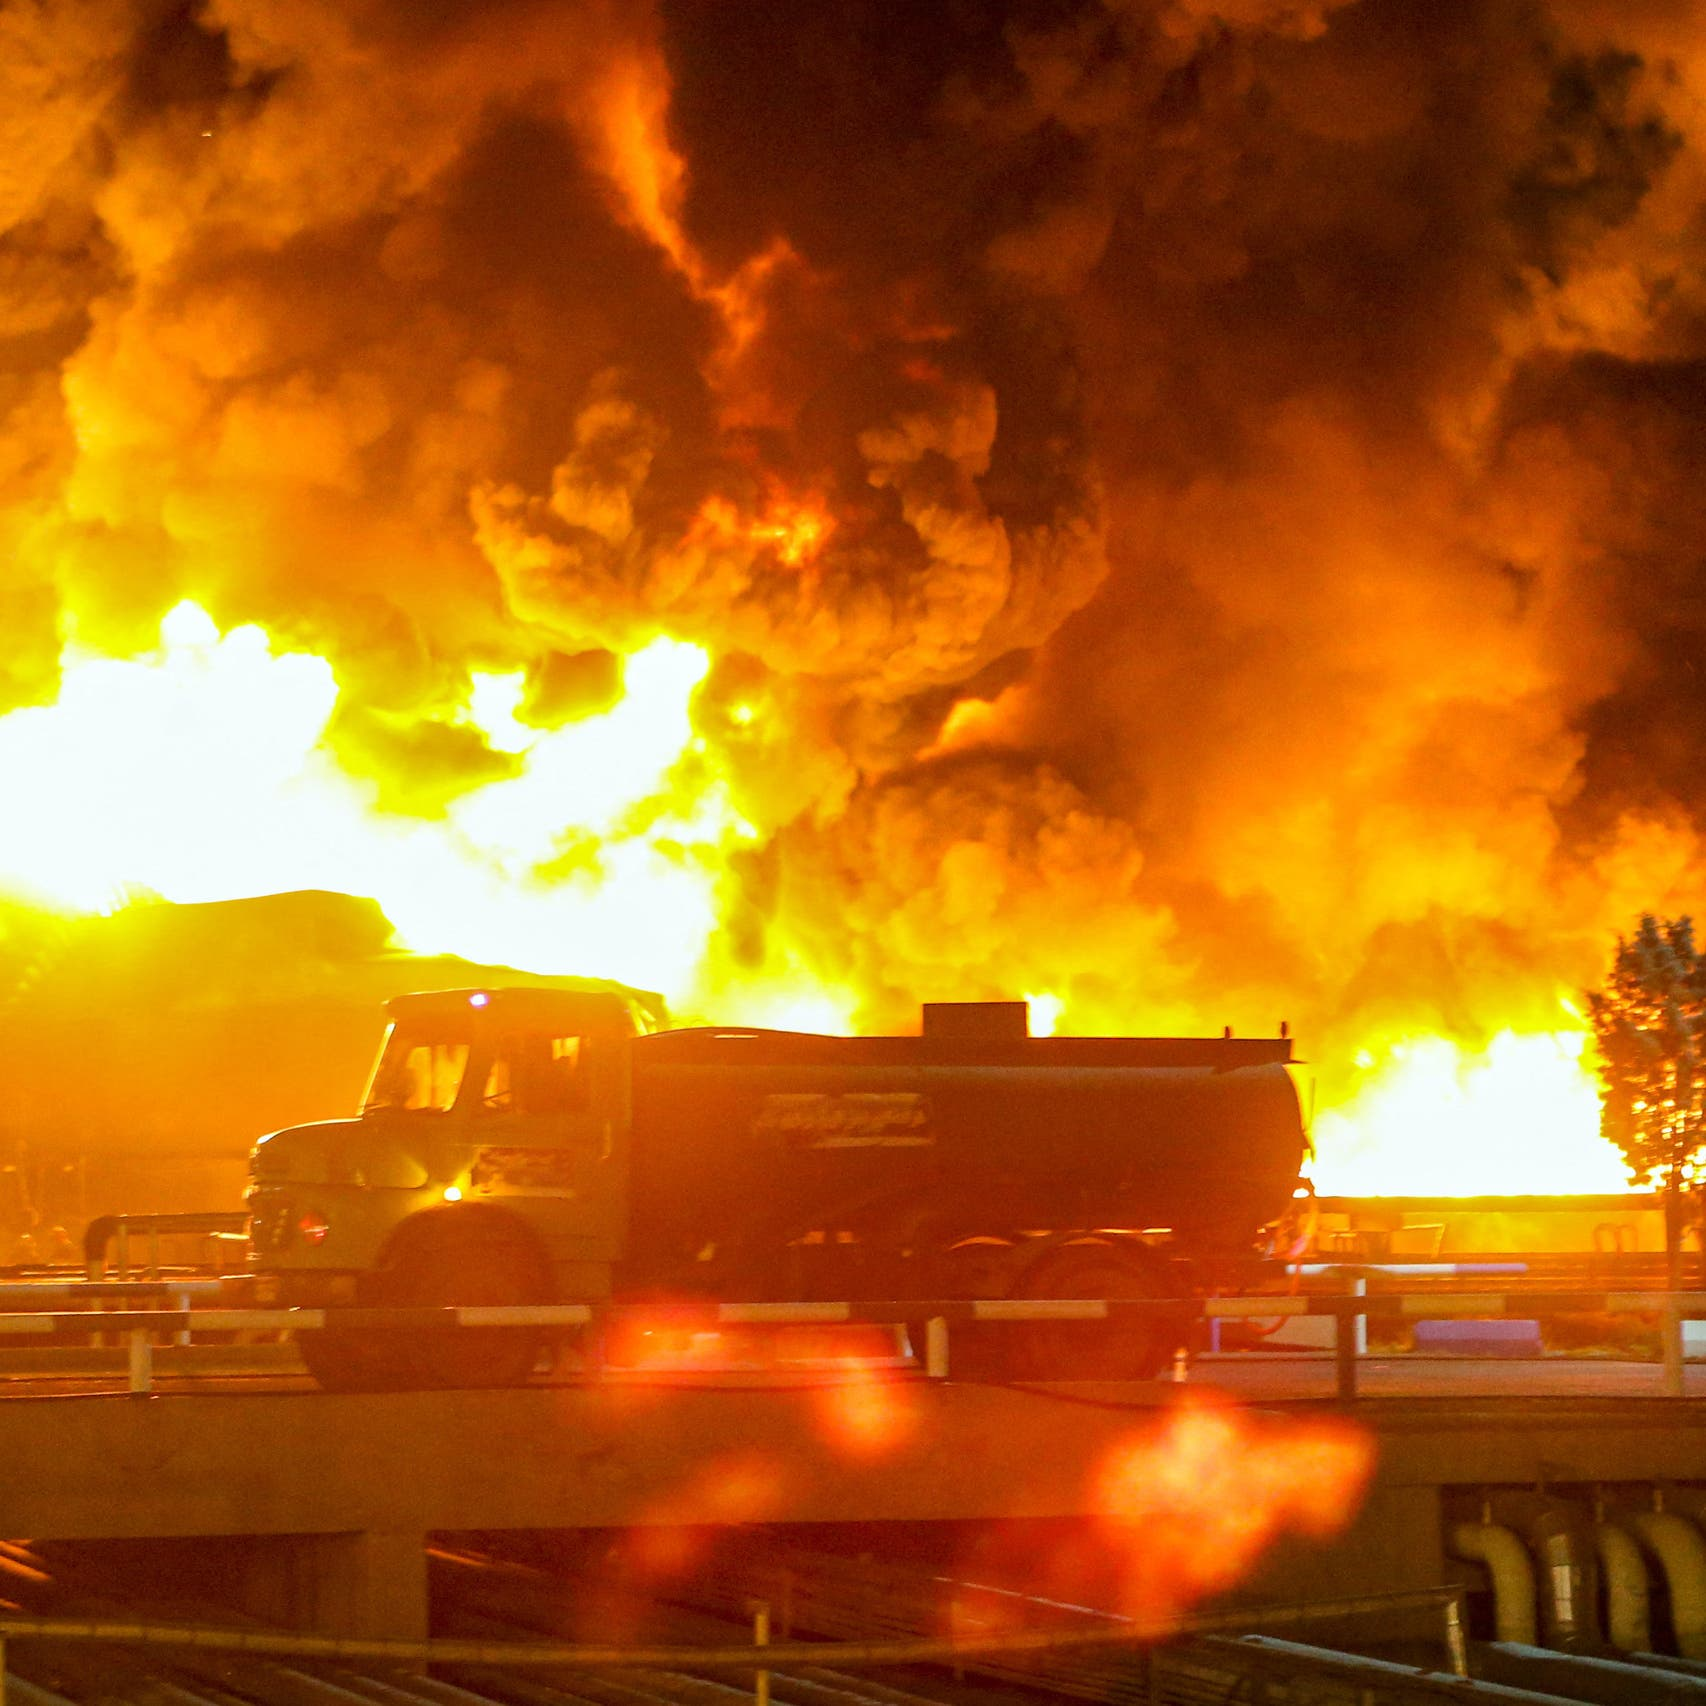 Oil refinery fire near Iran's capital burns into second day